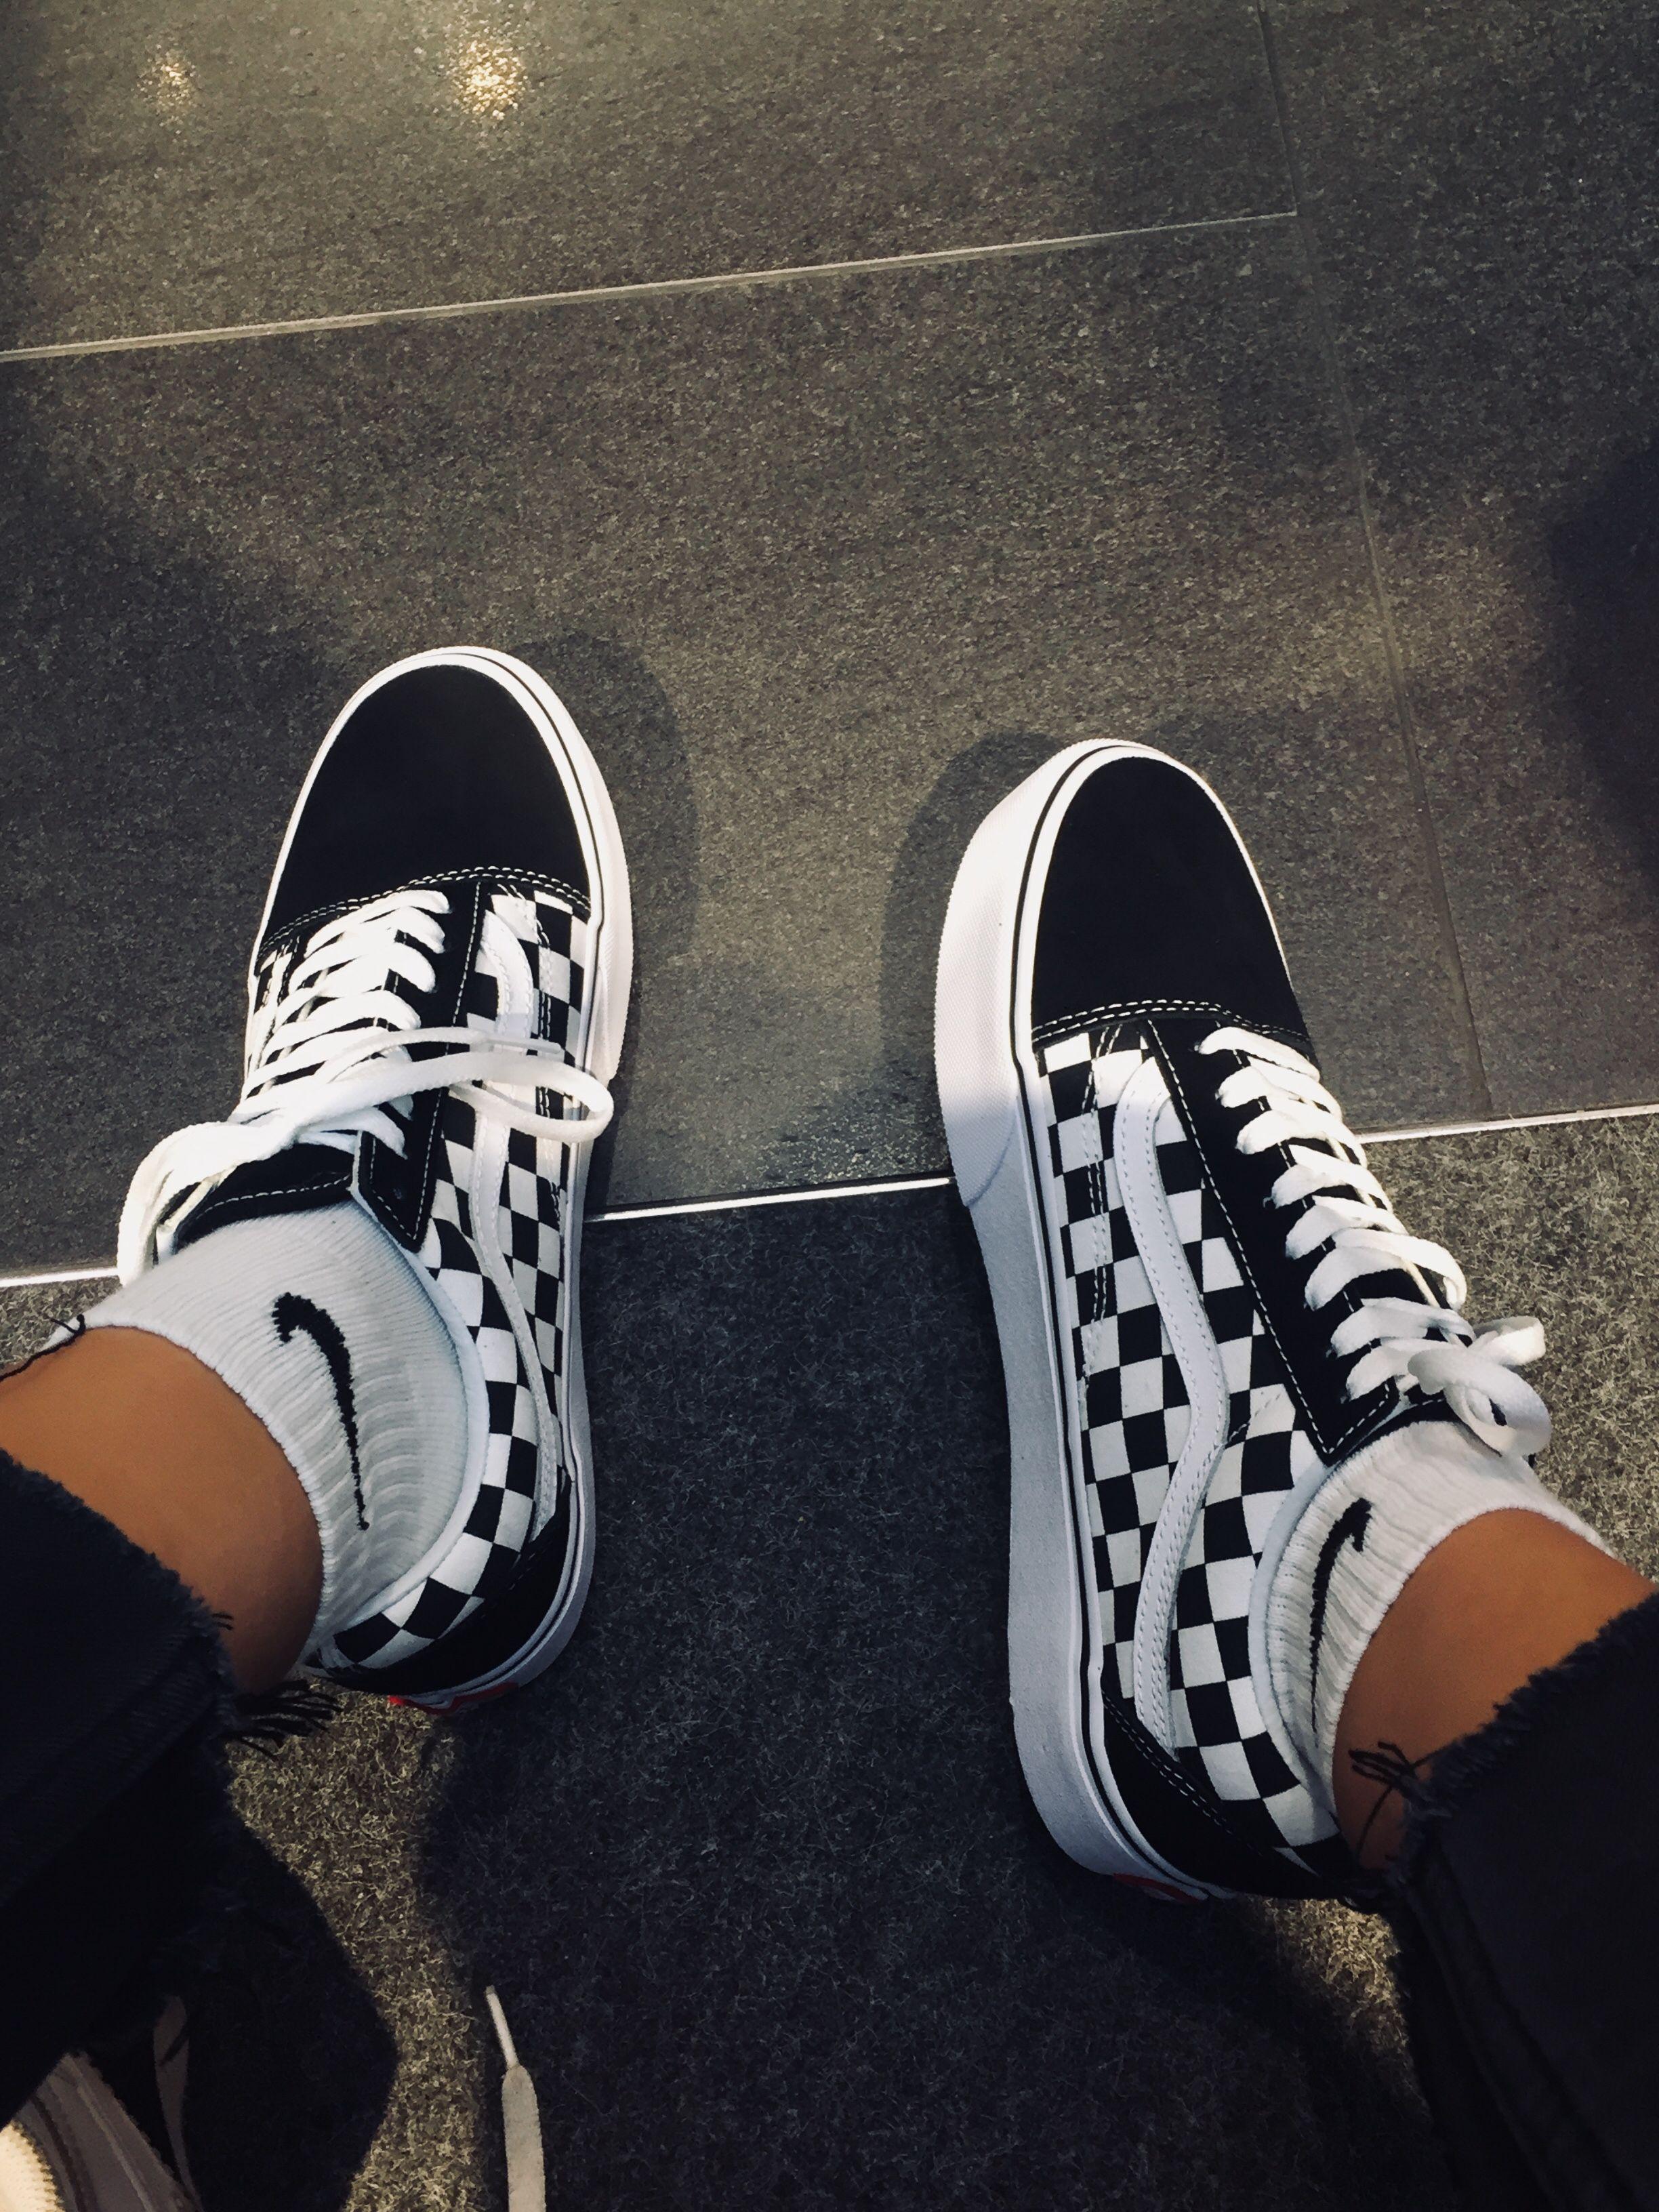 29 Best V A N S images   Vans shoes, Cute shoes, Me too shoes